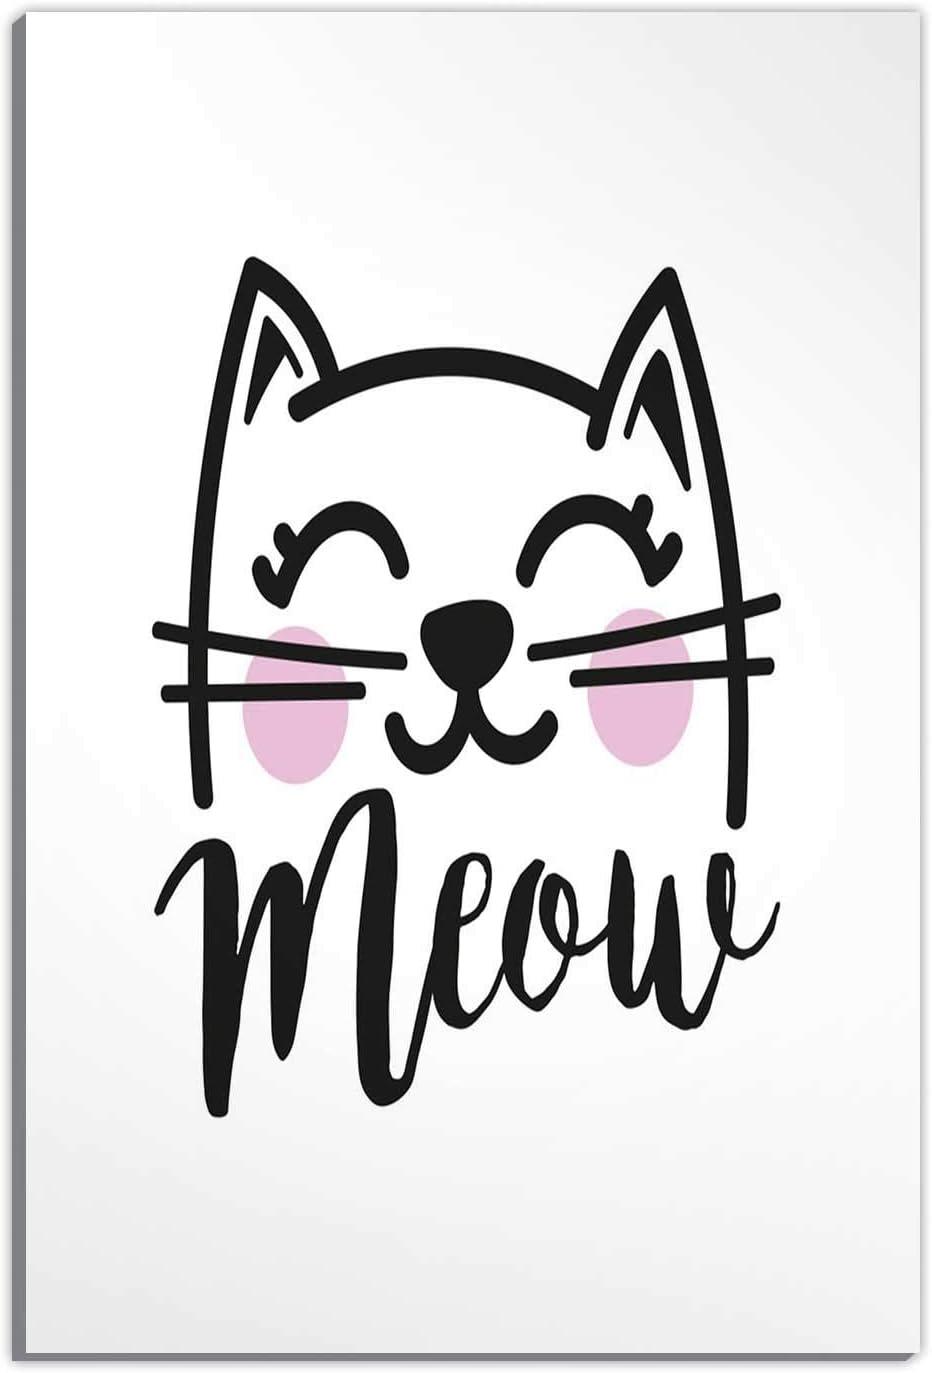 Amazon Com Hitecera Cat Meow Drawing Writing No 3690 Wall Art Decor For Living Room Painting Canvas Set 12 X18 Home Kitchen,Patty Pan Squash